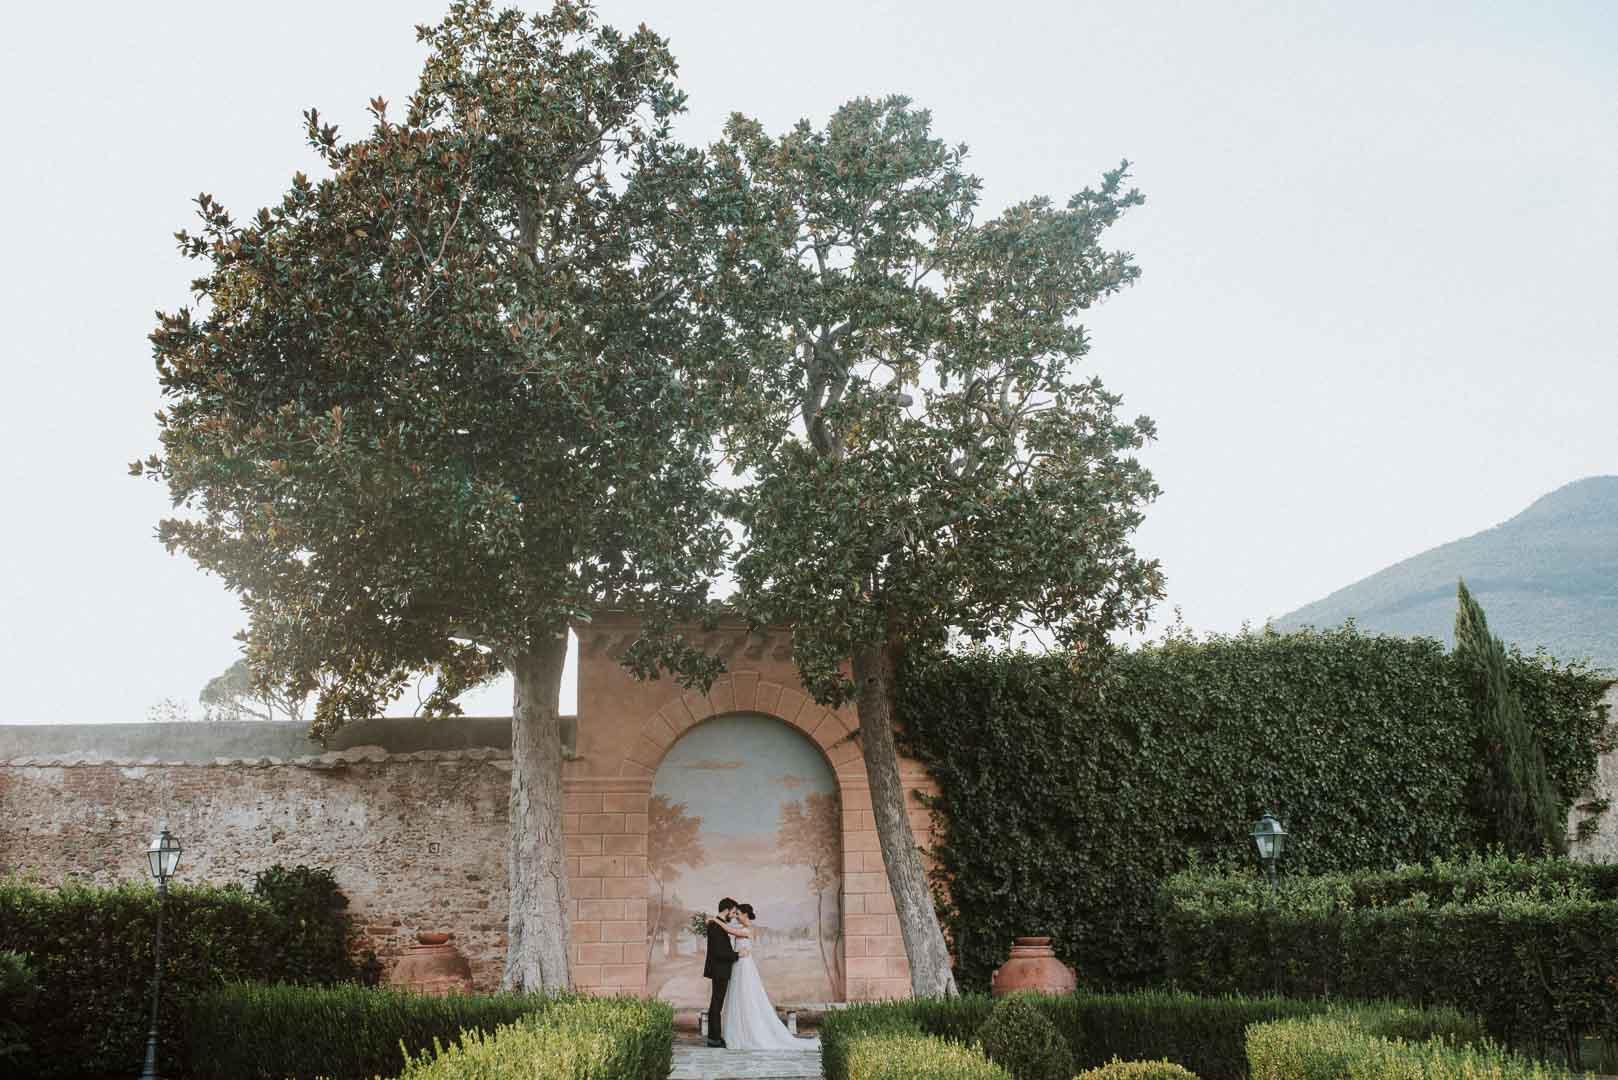 wedding-photographer-destination-fineart-bespoke-reportage-tuscany-villascorzi-vivianeizzo-spazio46-96